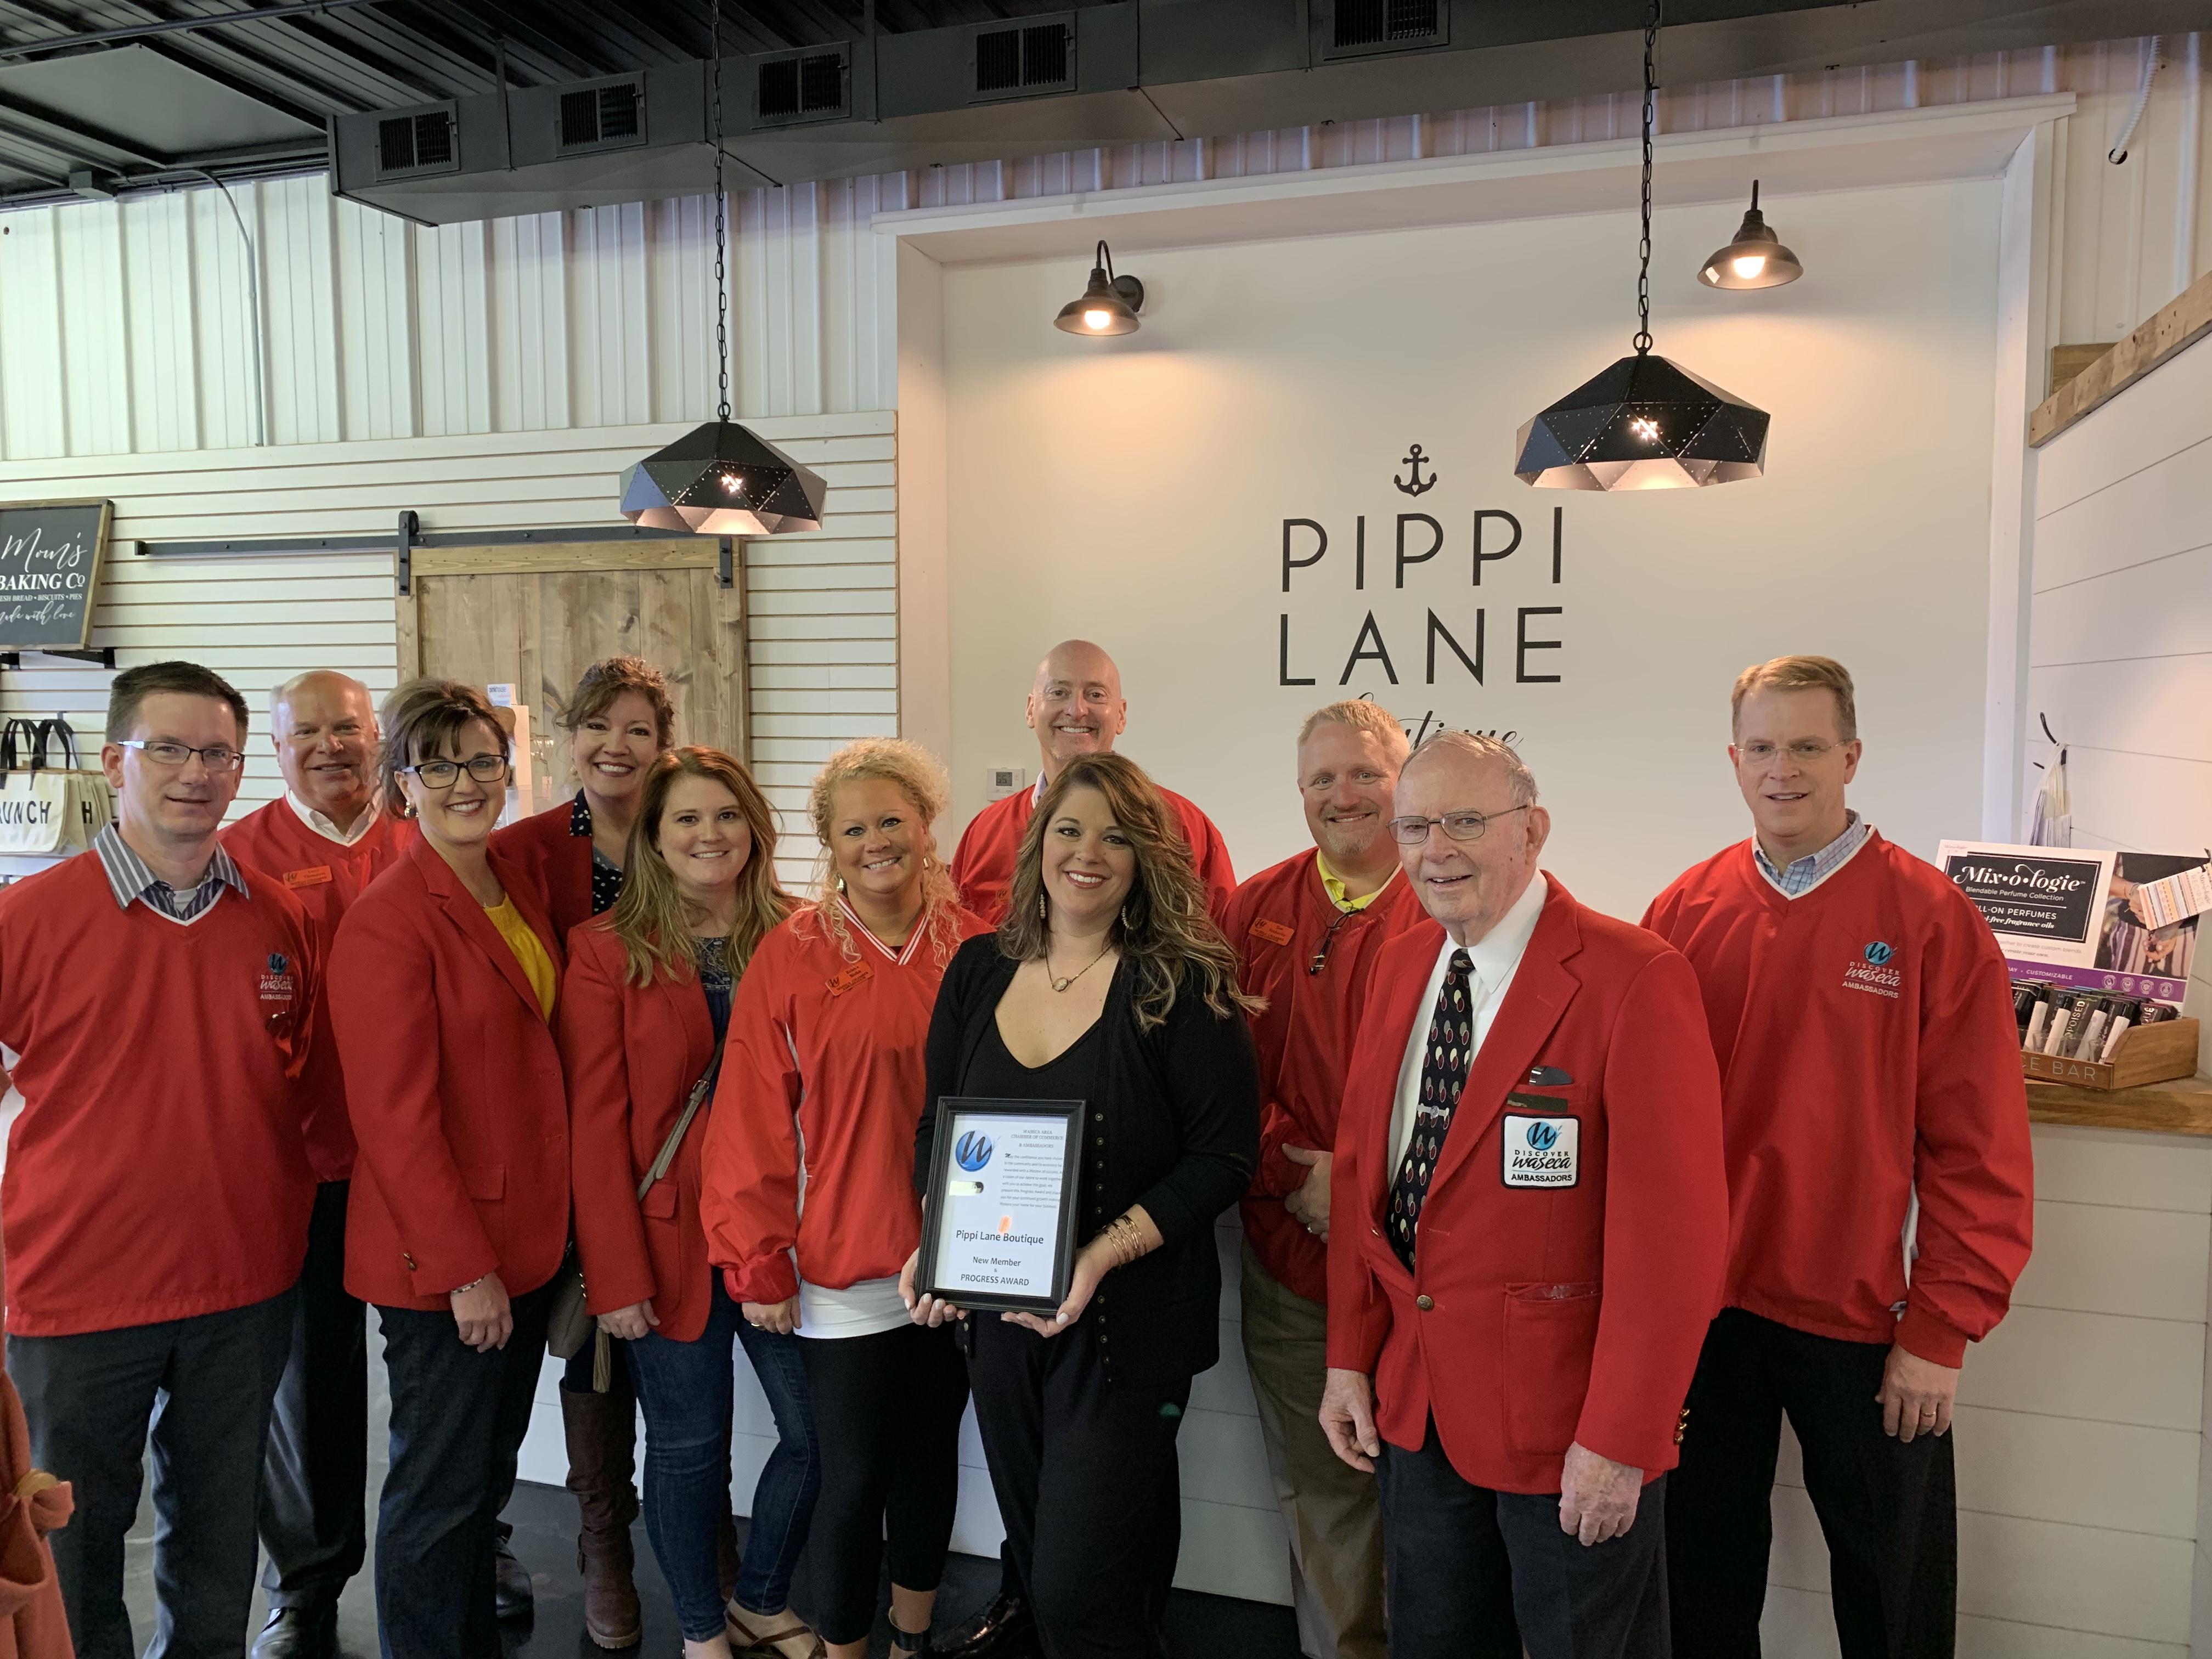 Pippi-Lane-Progress-and-New-Member-May-2019.jpg